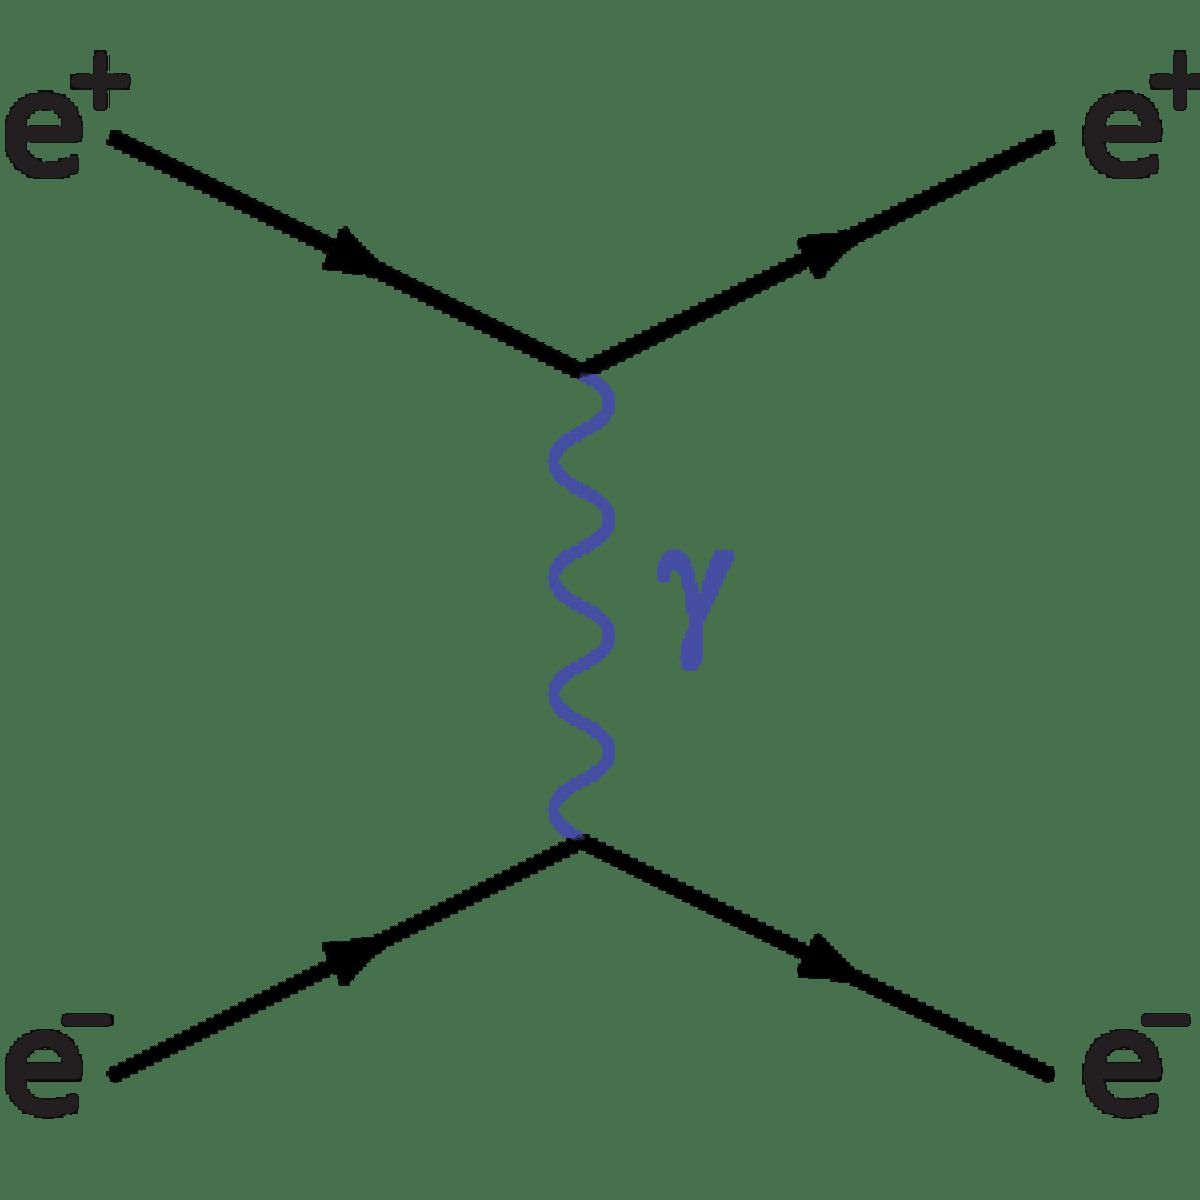 Feynman Diagrams: An Introduction